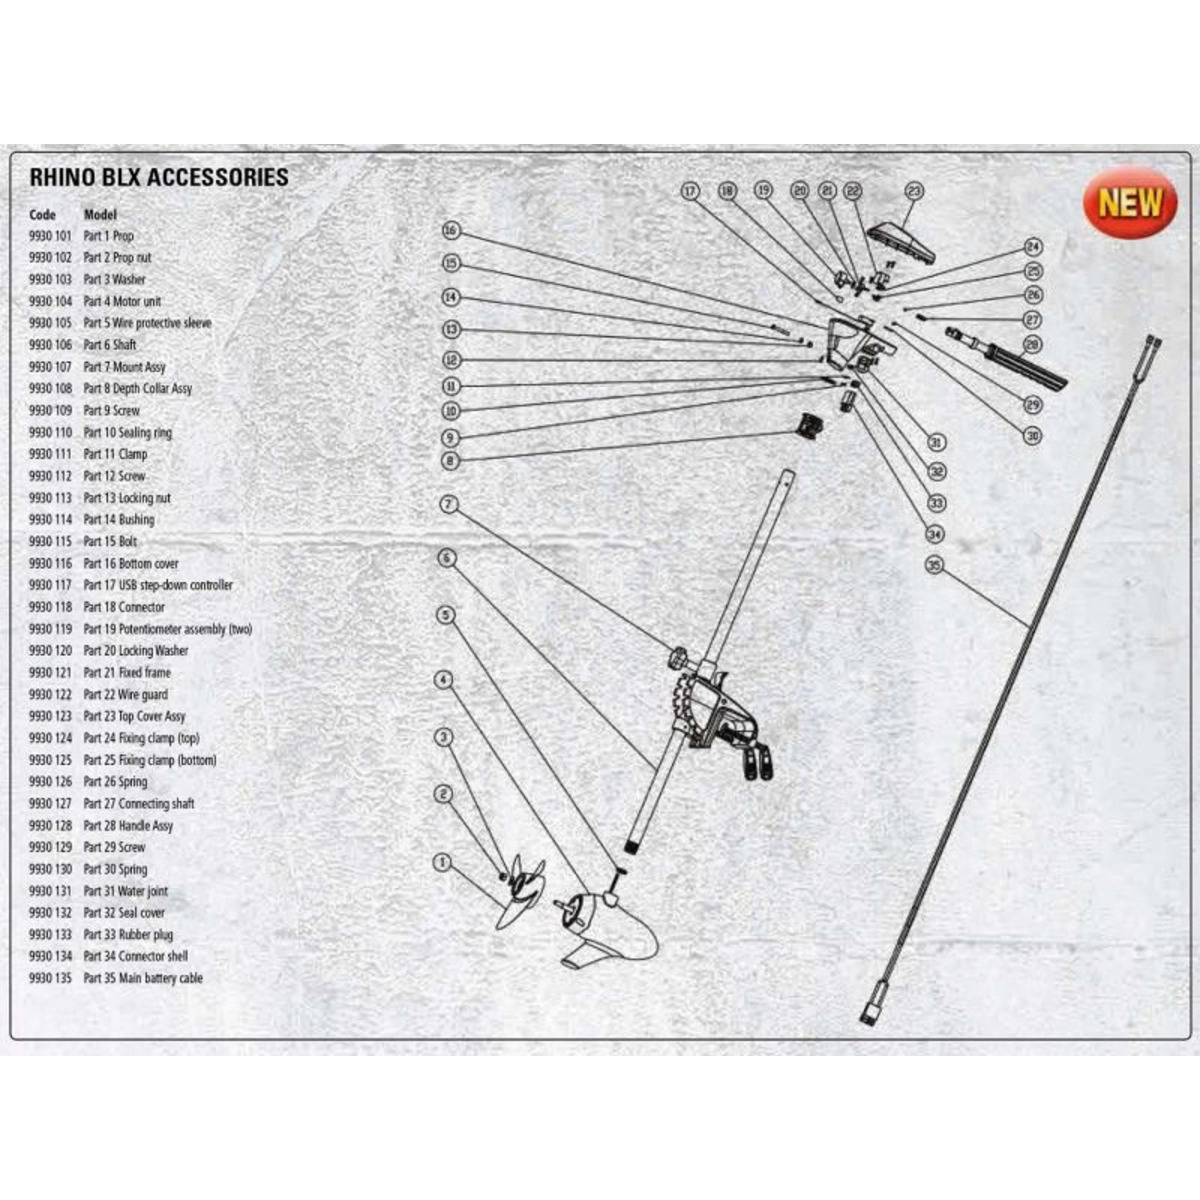 Rhino Hélice para Motor Eléctrico BLX 70 - Parte 1